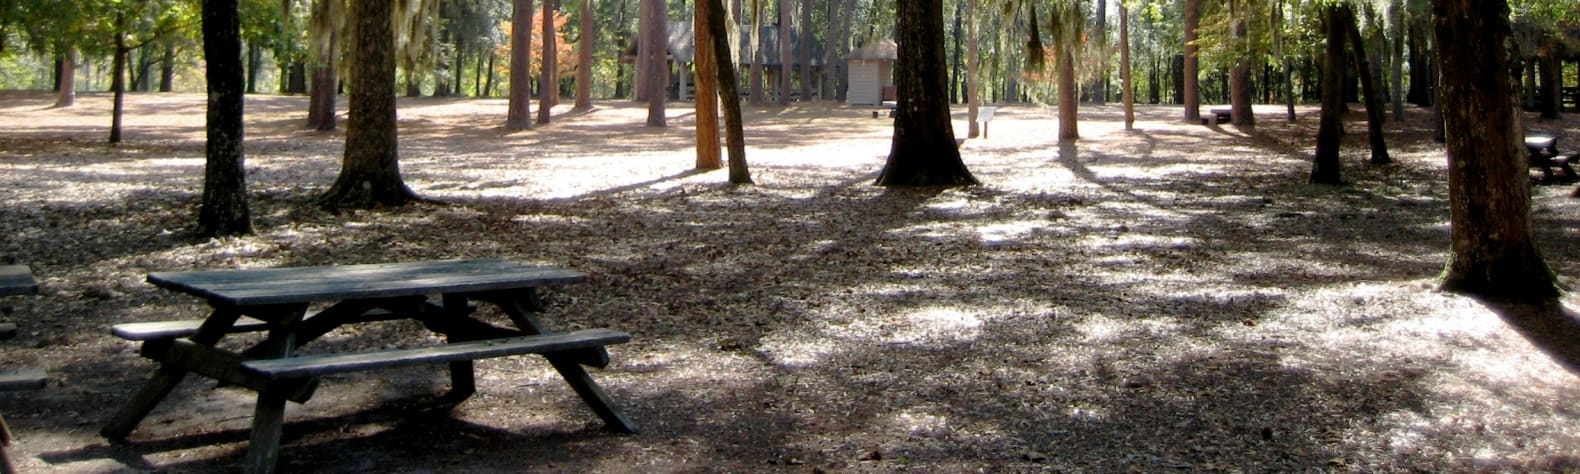 Lee State Park